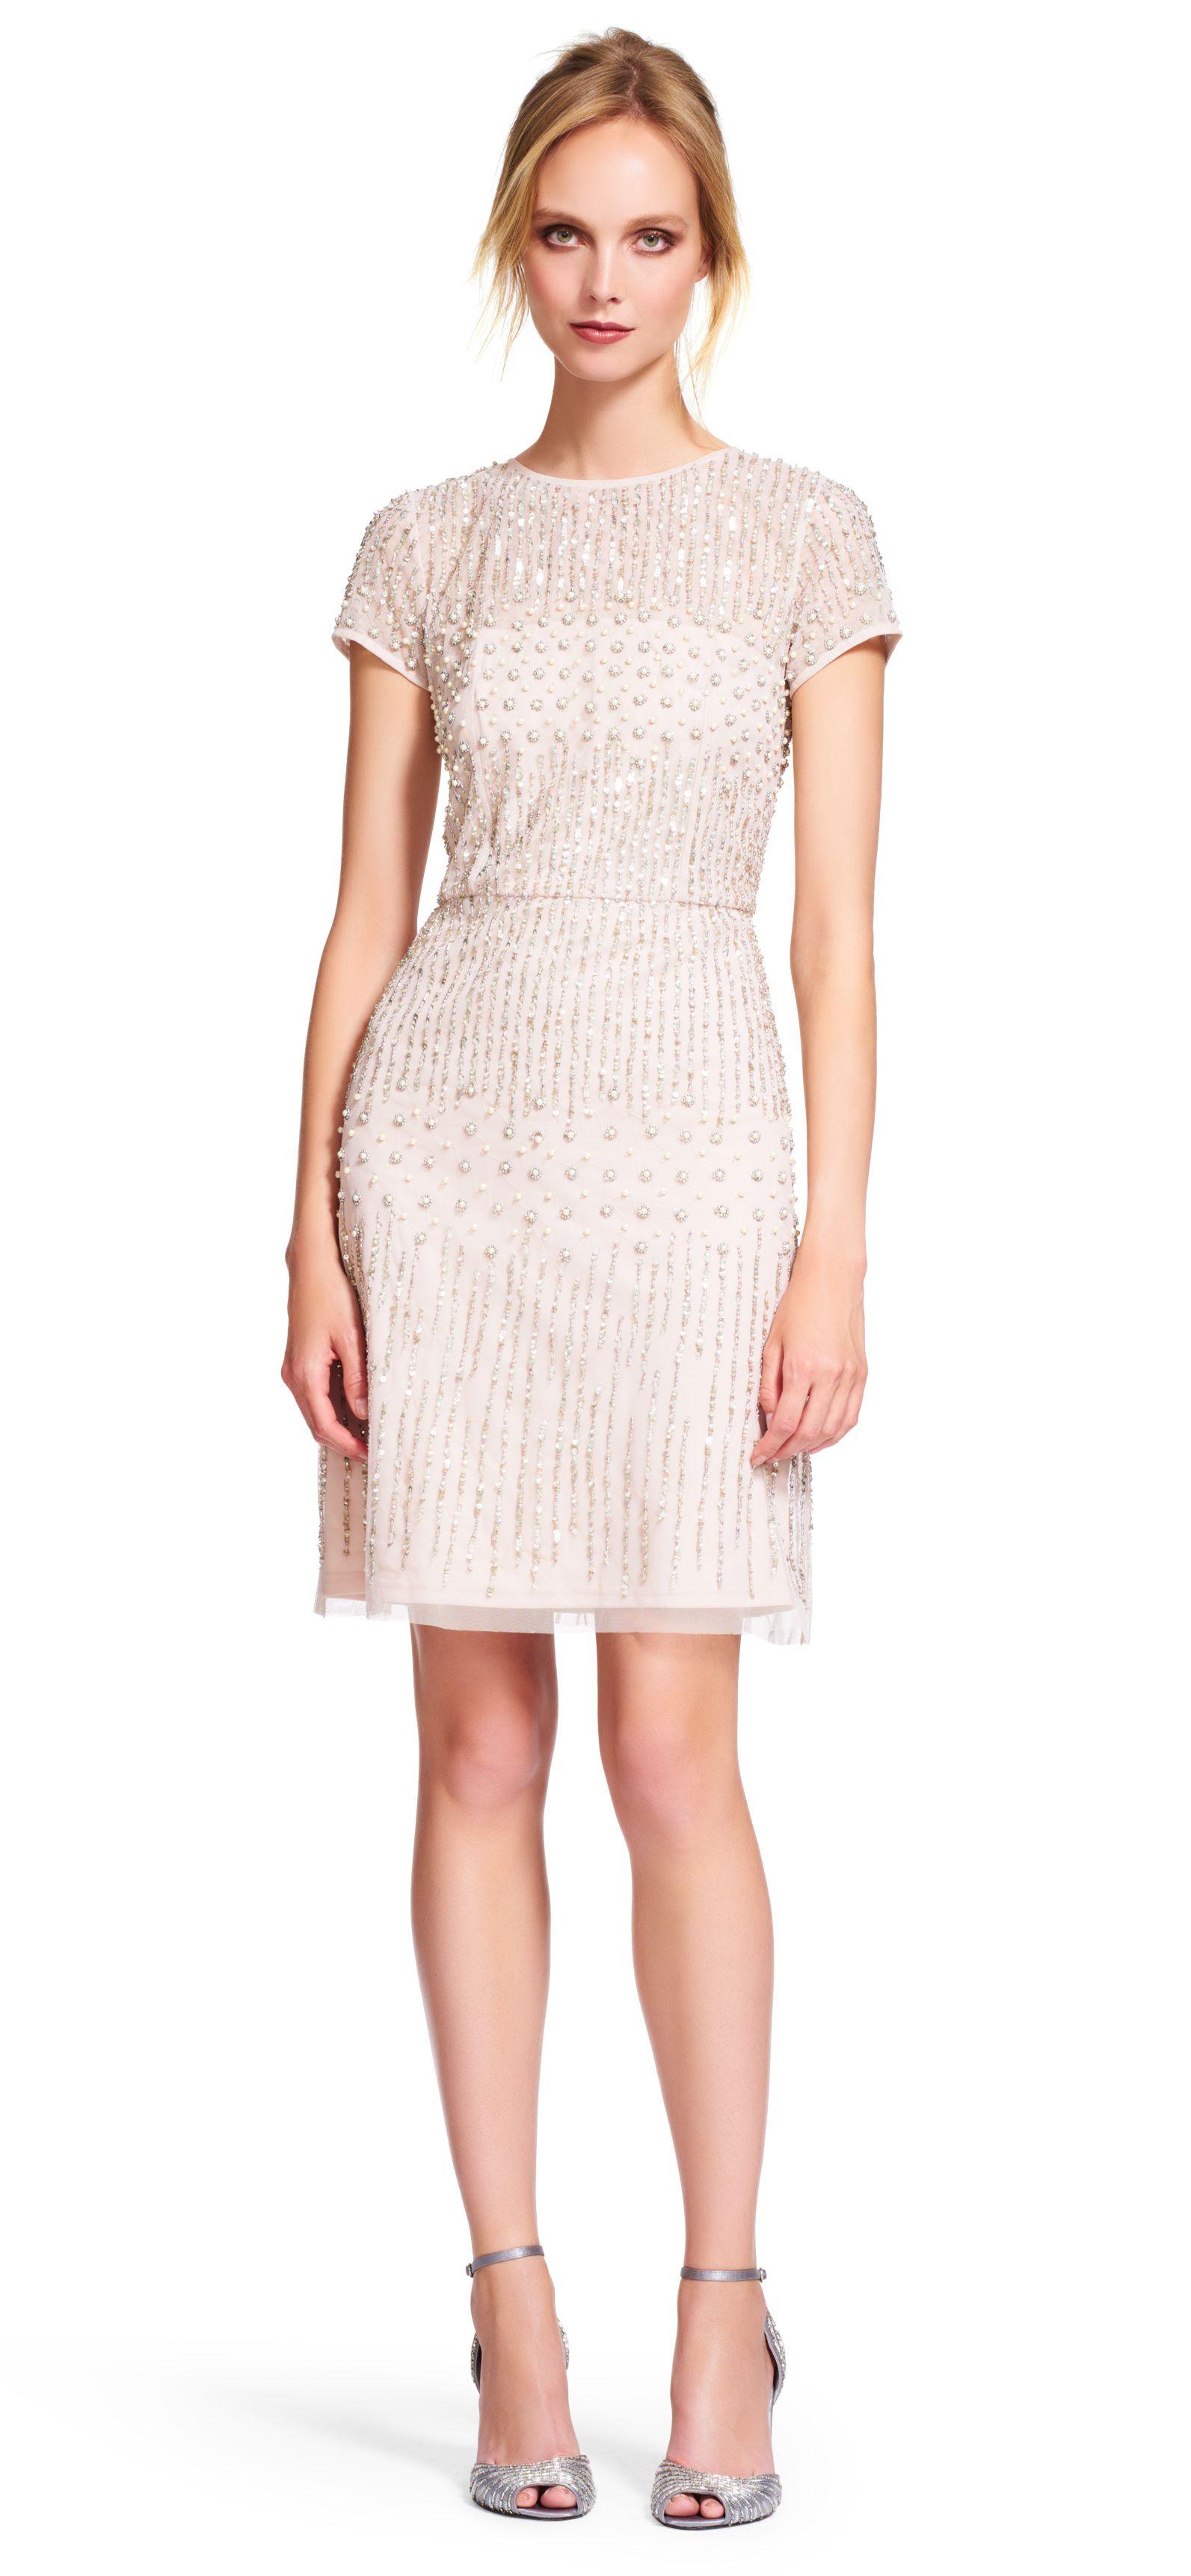 e74bbbf5ddf Adrianna Papell short sleeve beaded cocktail dress